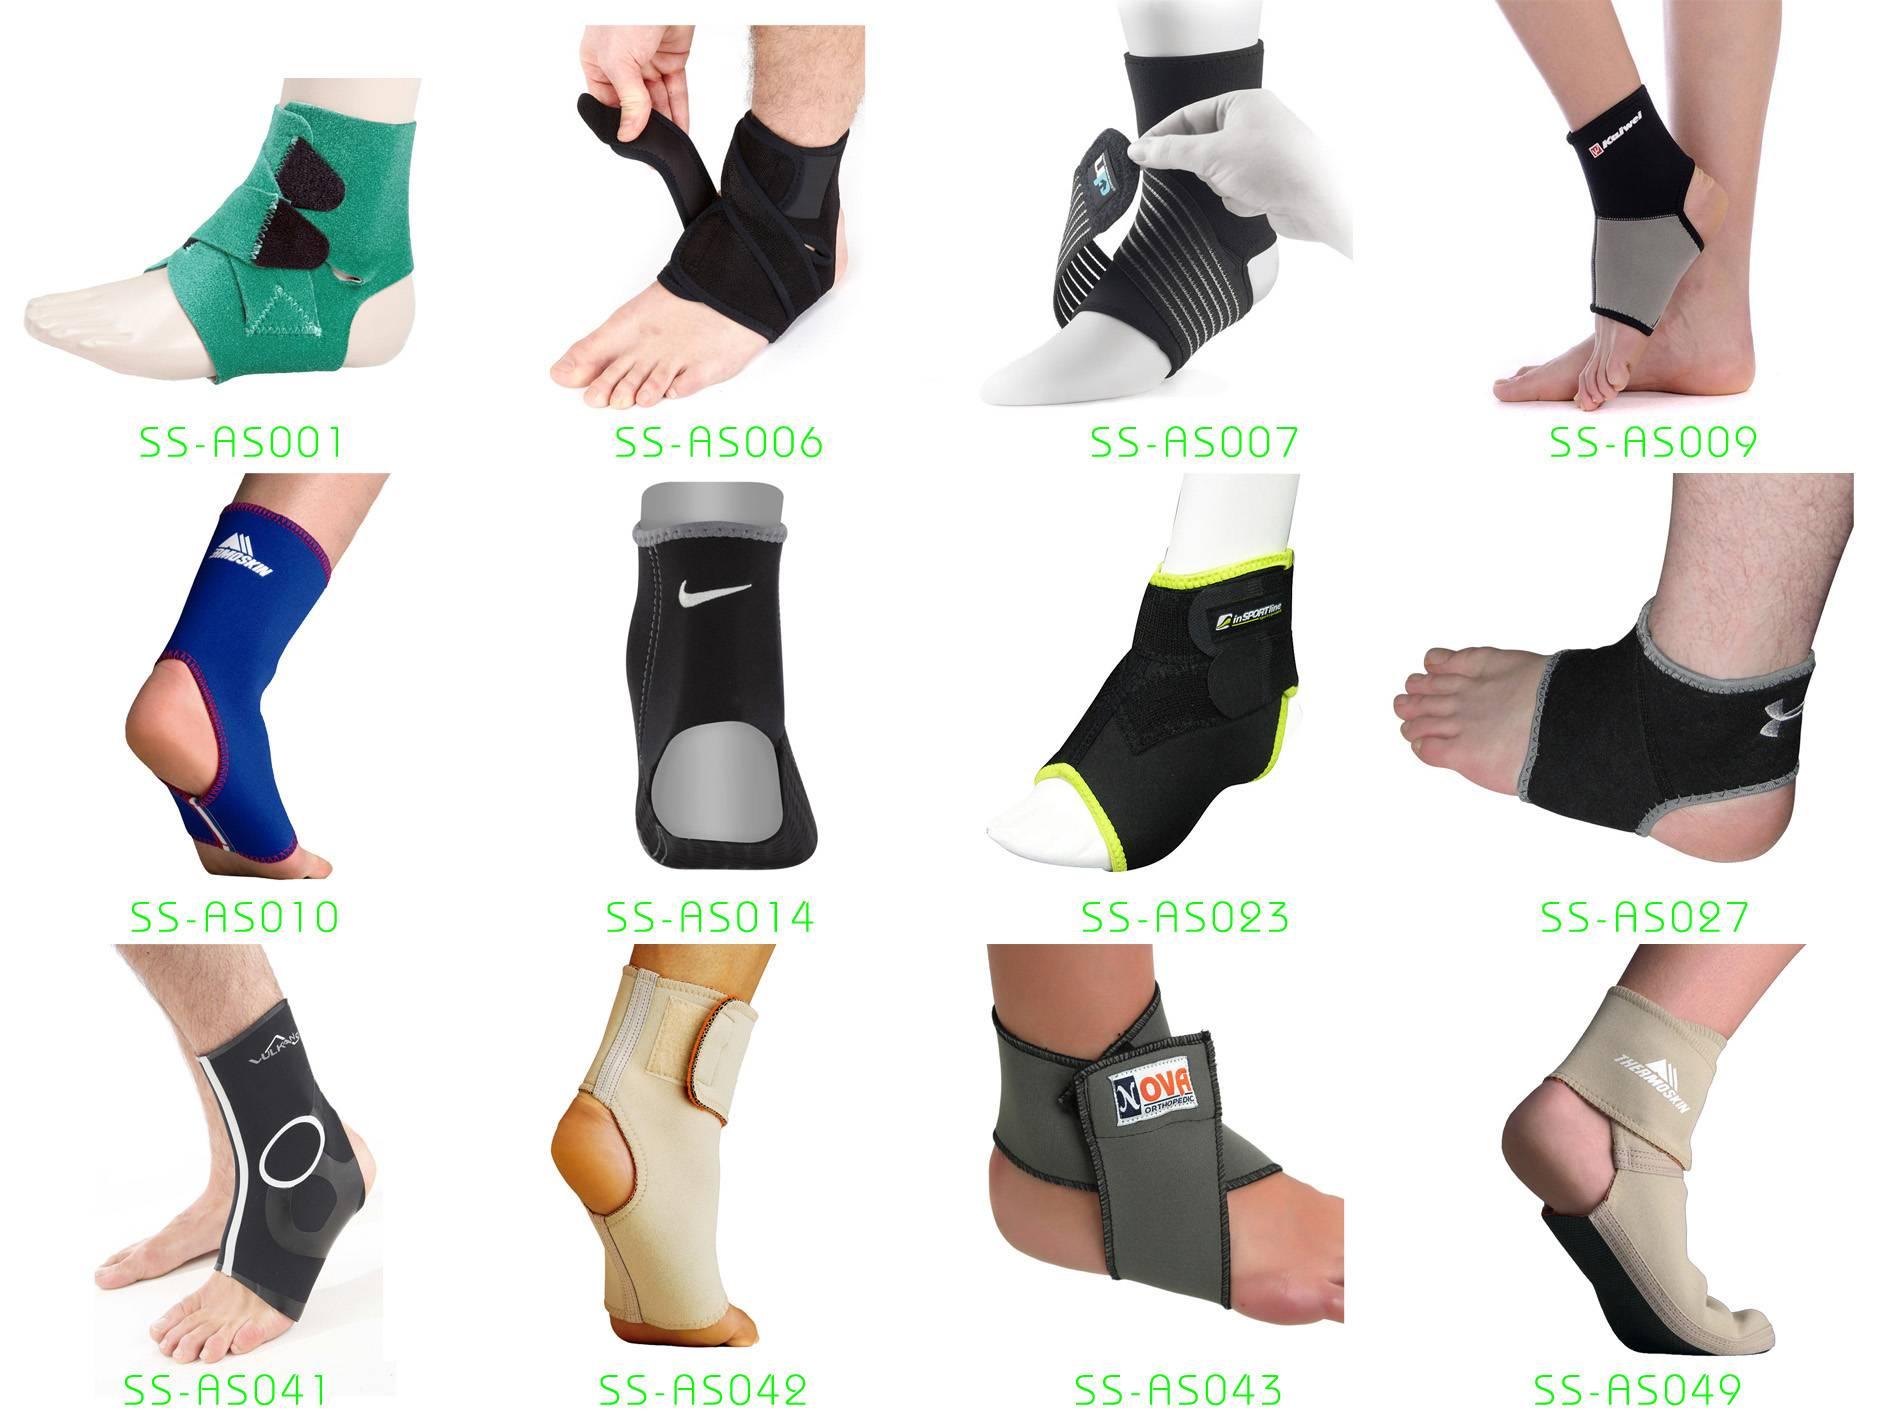 Neoprene Ankle Support/Brace/Protectors Various Designs